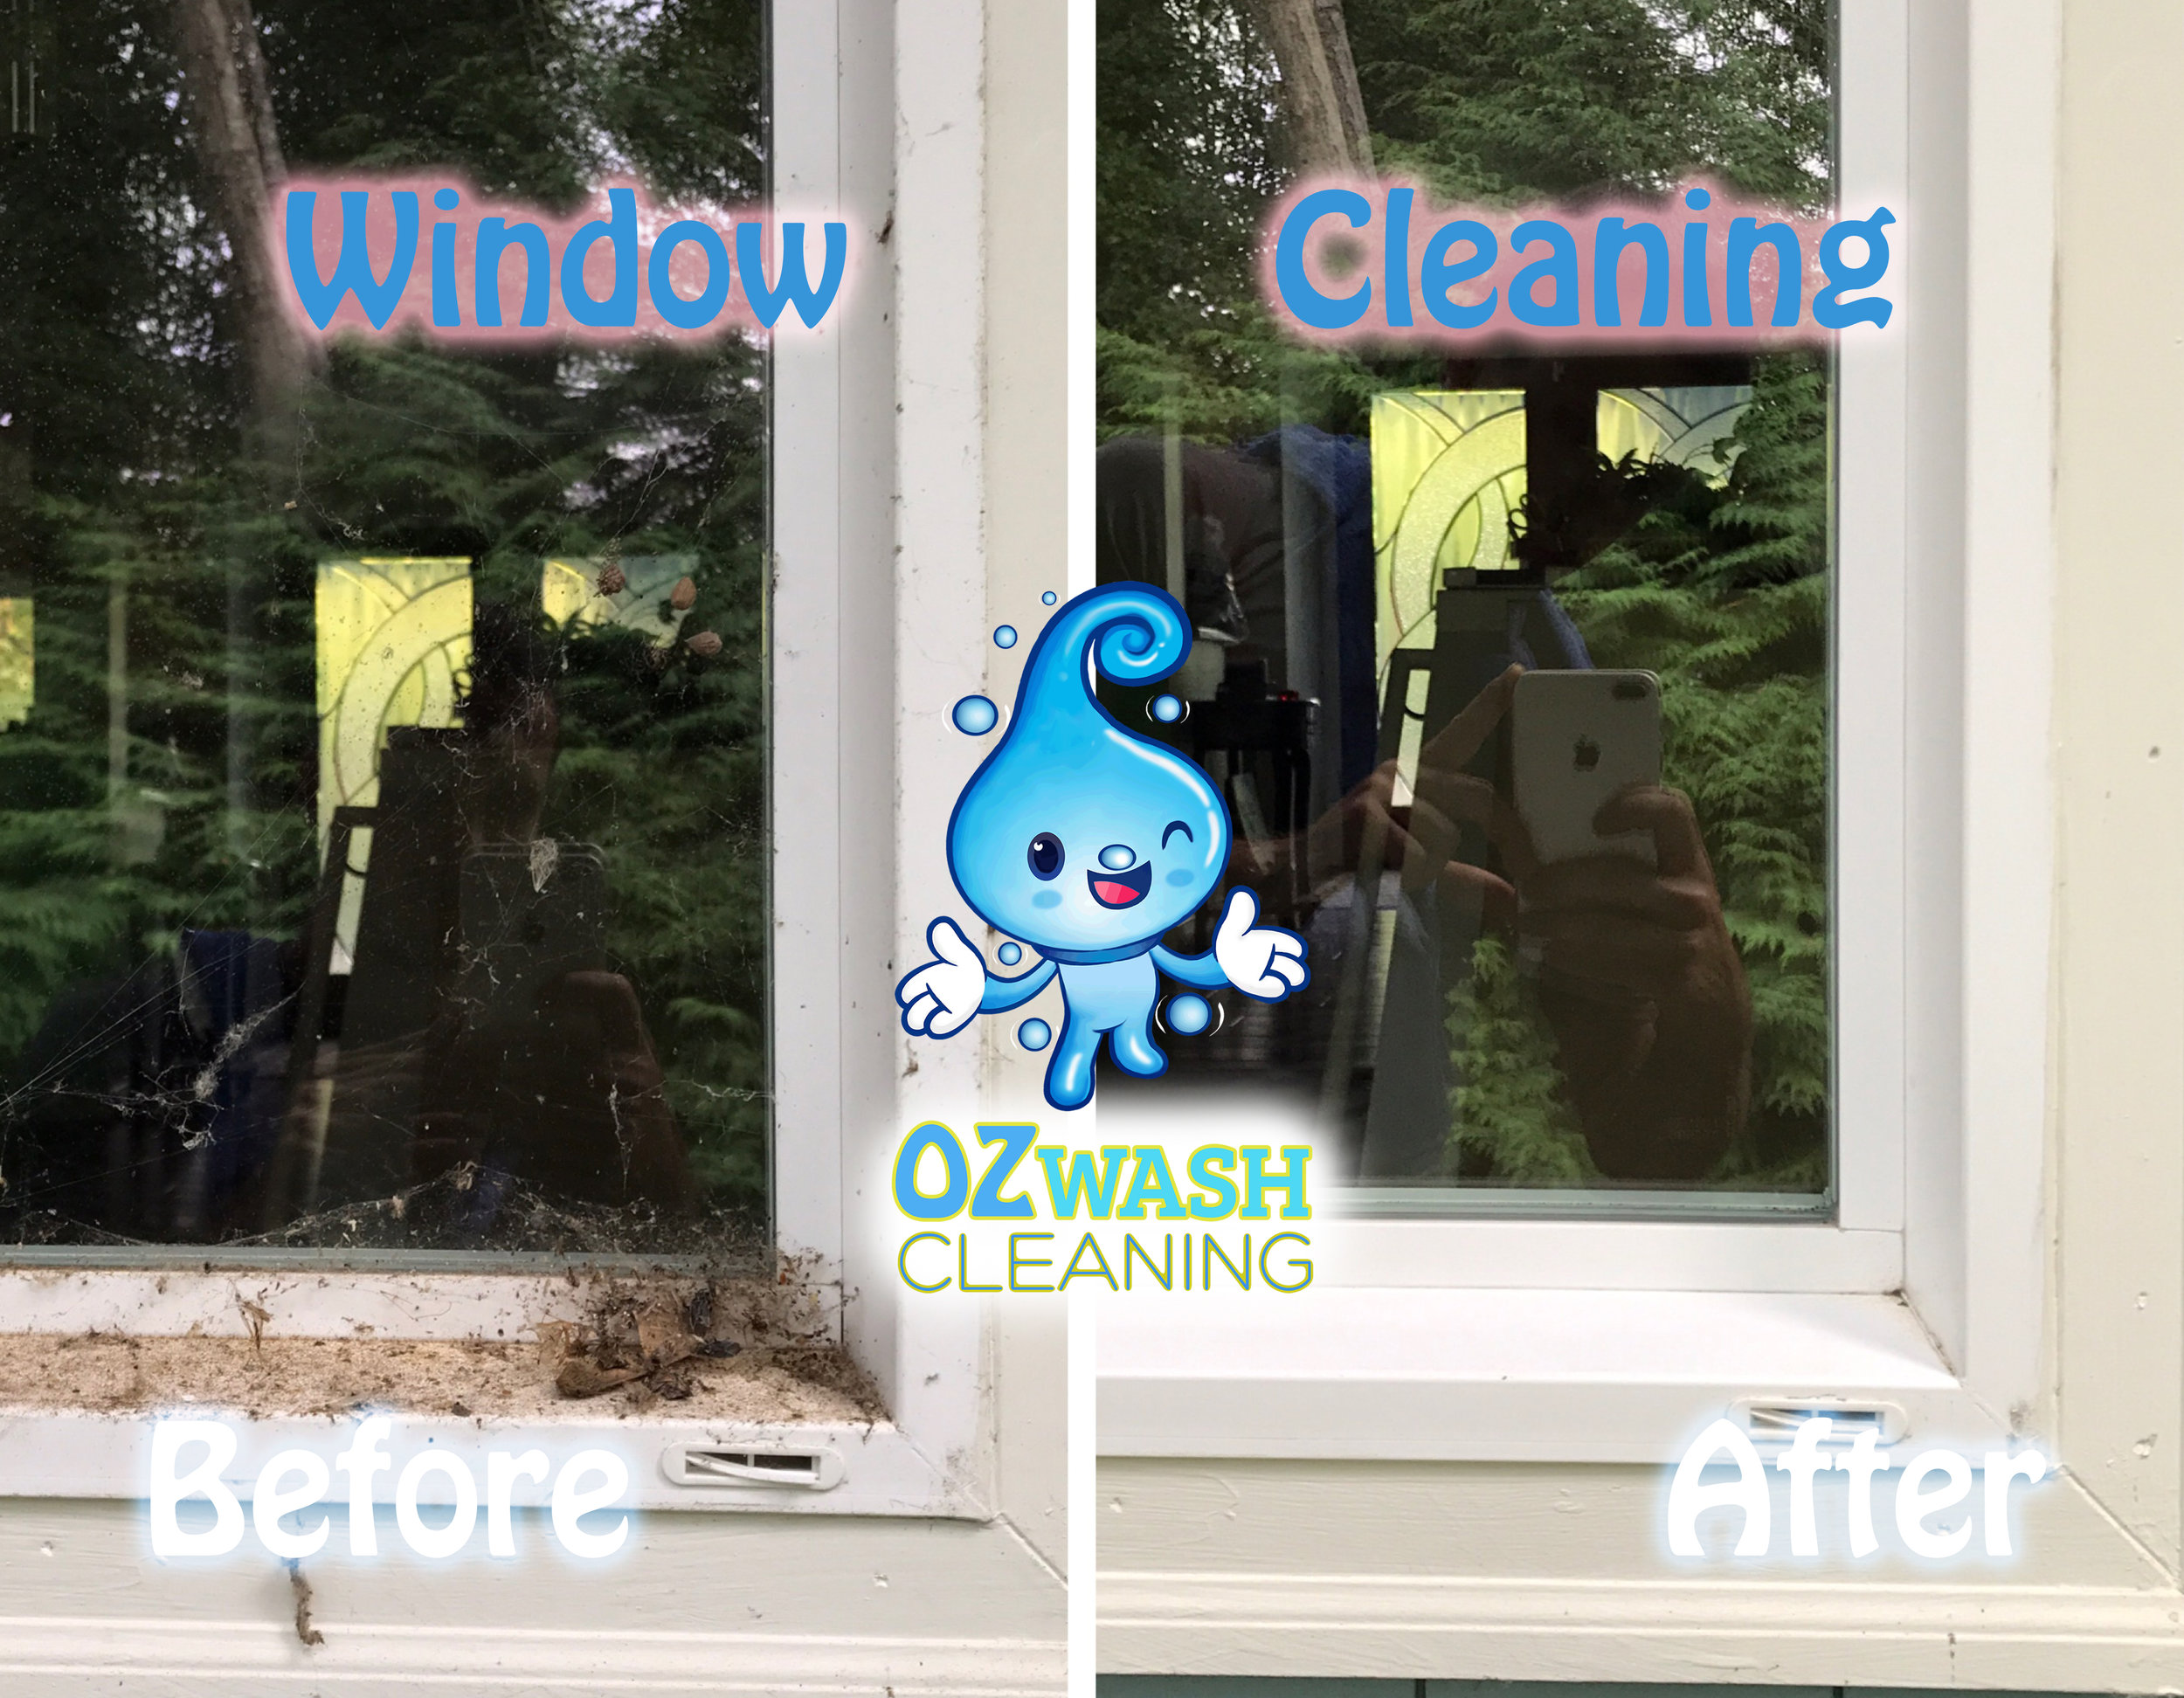 WindowCleaning7.jpg